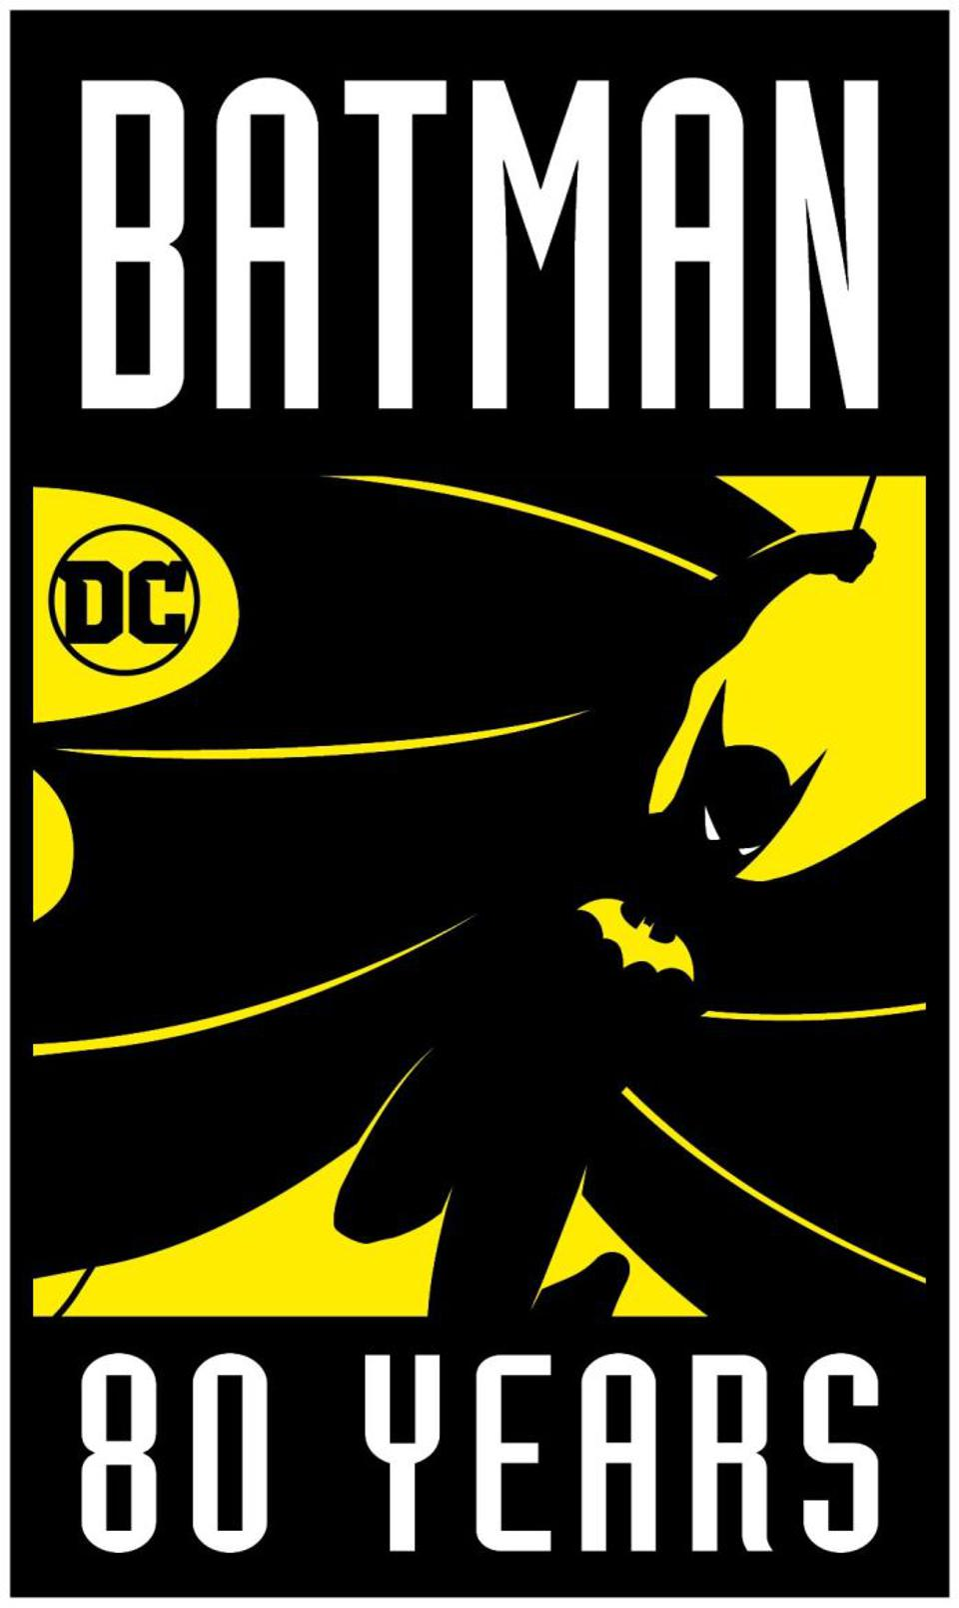 Batman celebrates his 80th anniversary this year